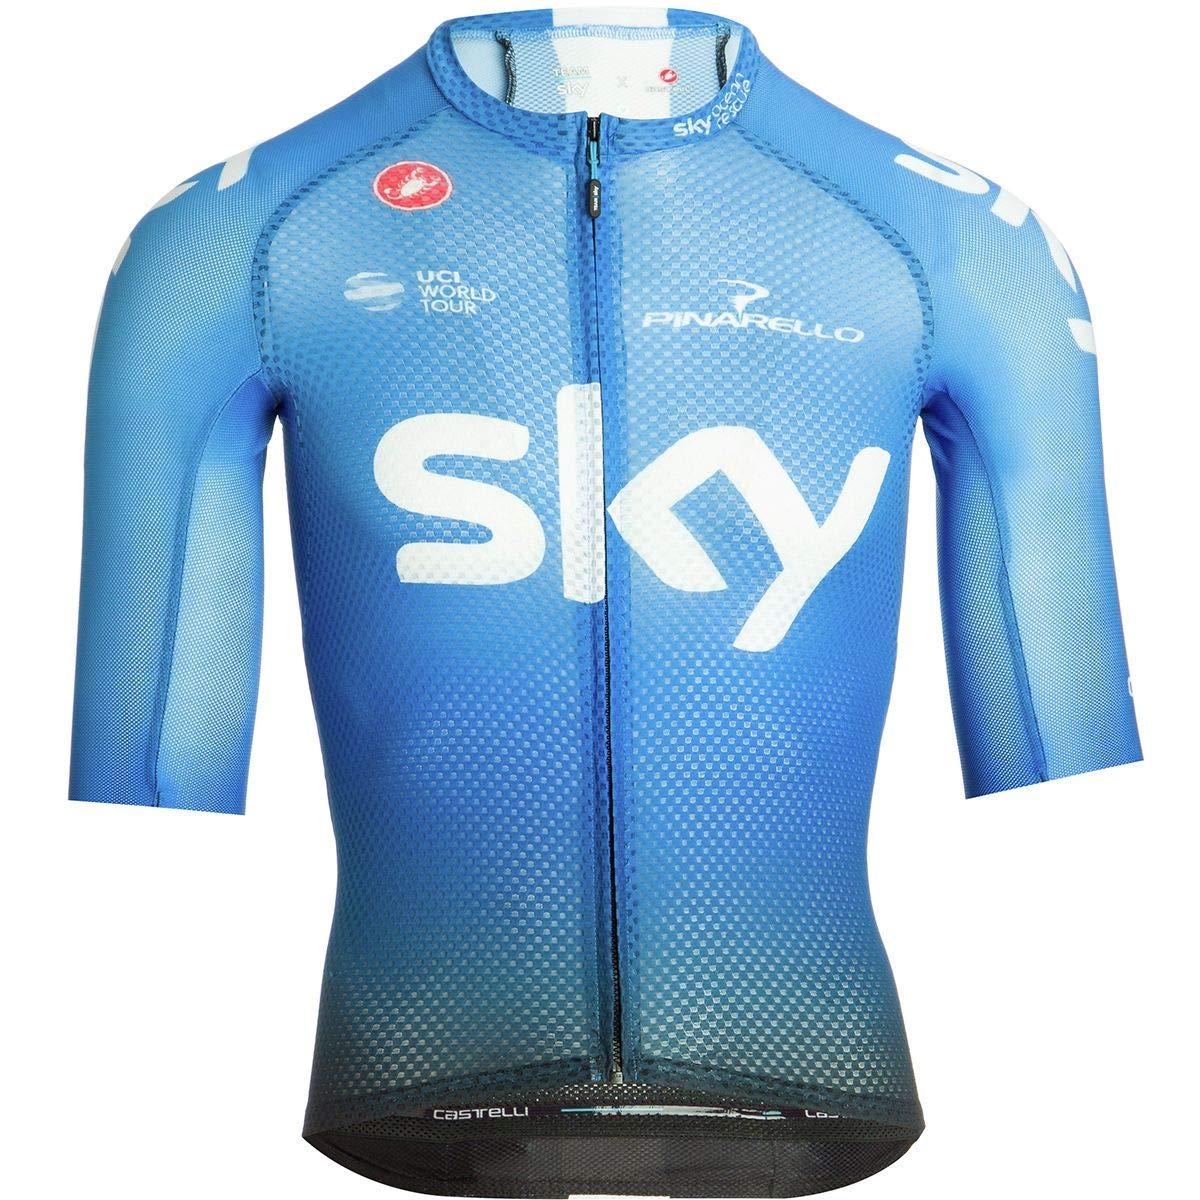 Amazon.com: Castelli Team Sky Climber 3.0 - Camiseta con ...